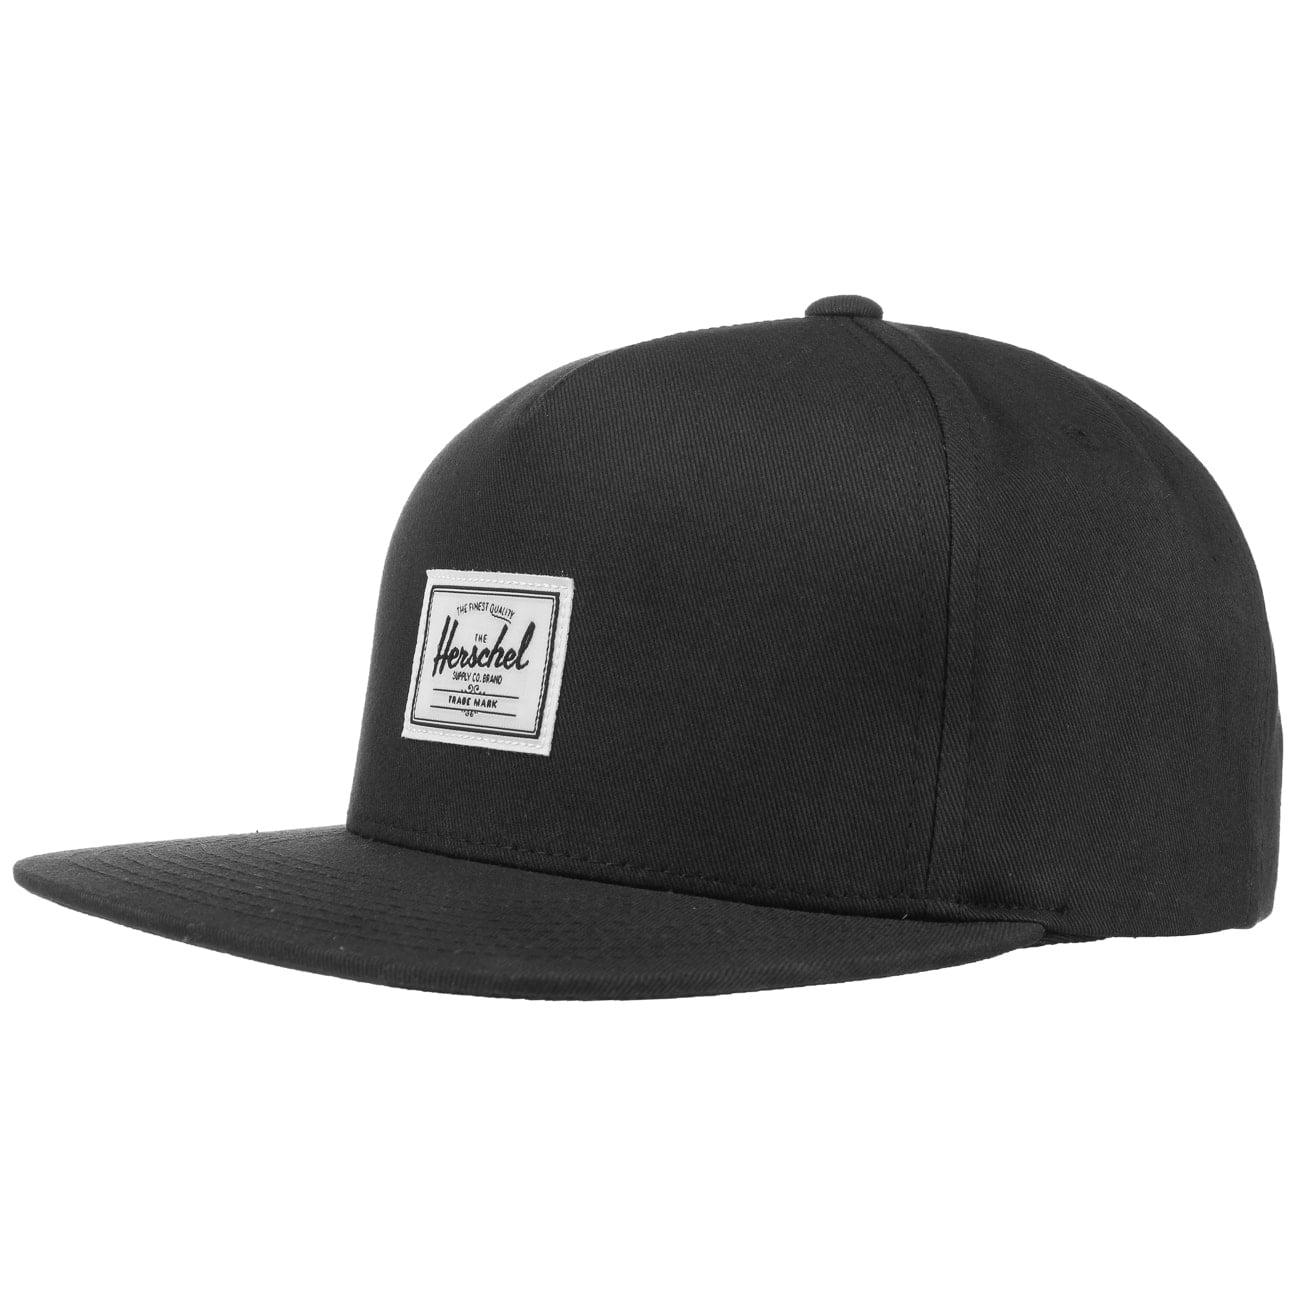 Gorra Deanie Snapback by Herschel  base cap